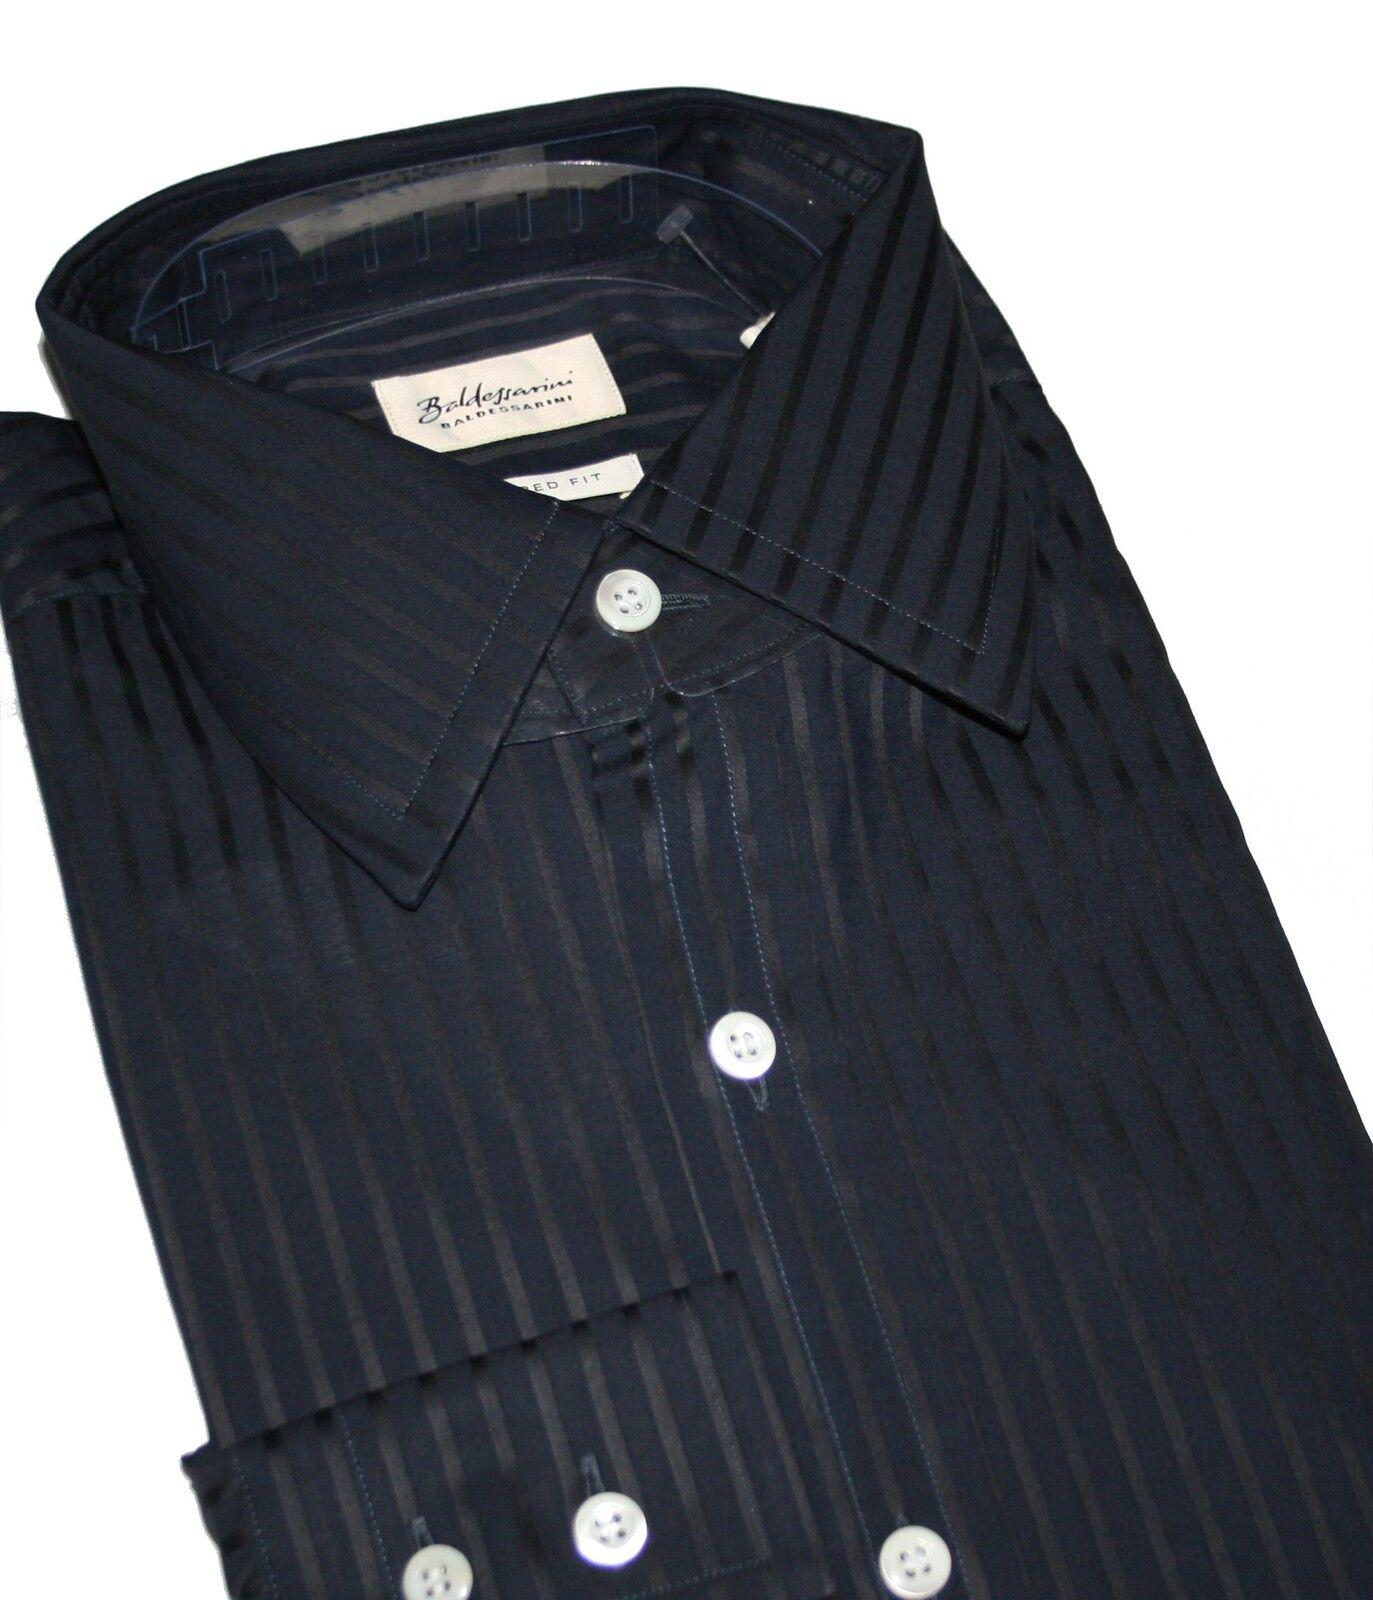 Baldessarini Signature Camicia 26 shaped Fit Camicia kw.40